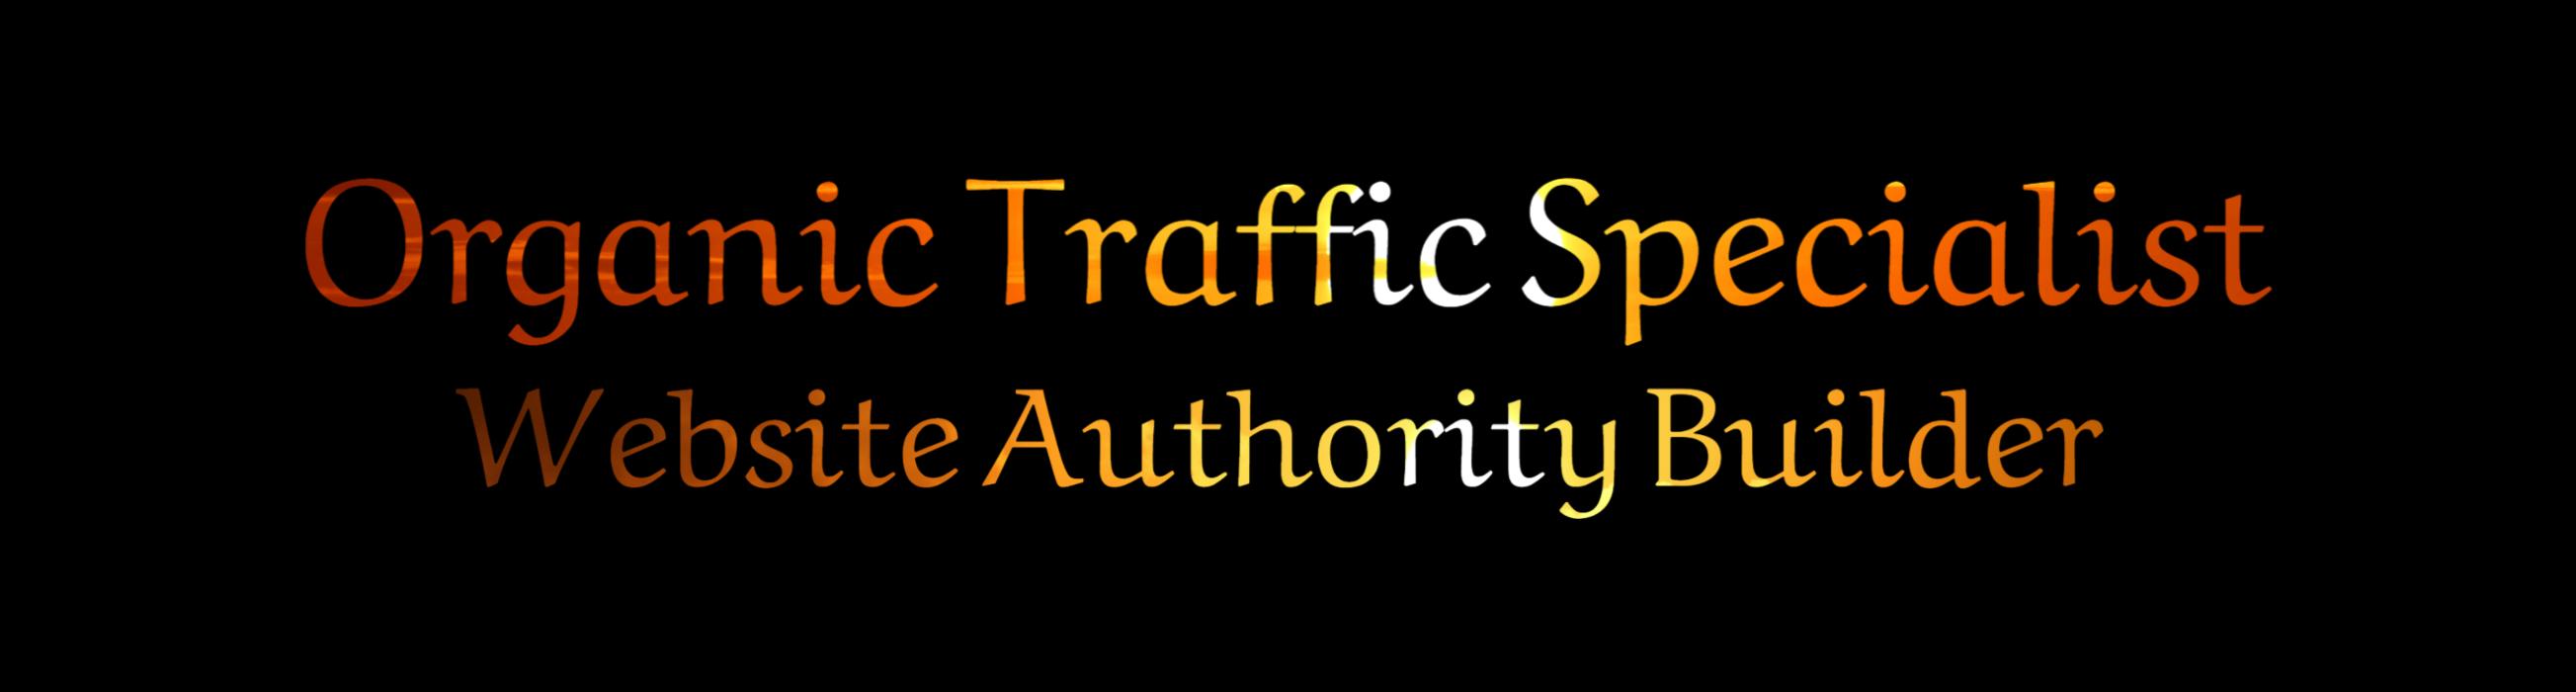 Organic Traffic Specialist and Website Authority Builder brodneil.com